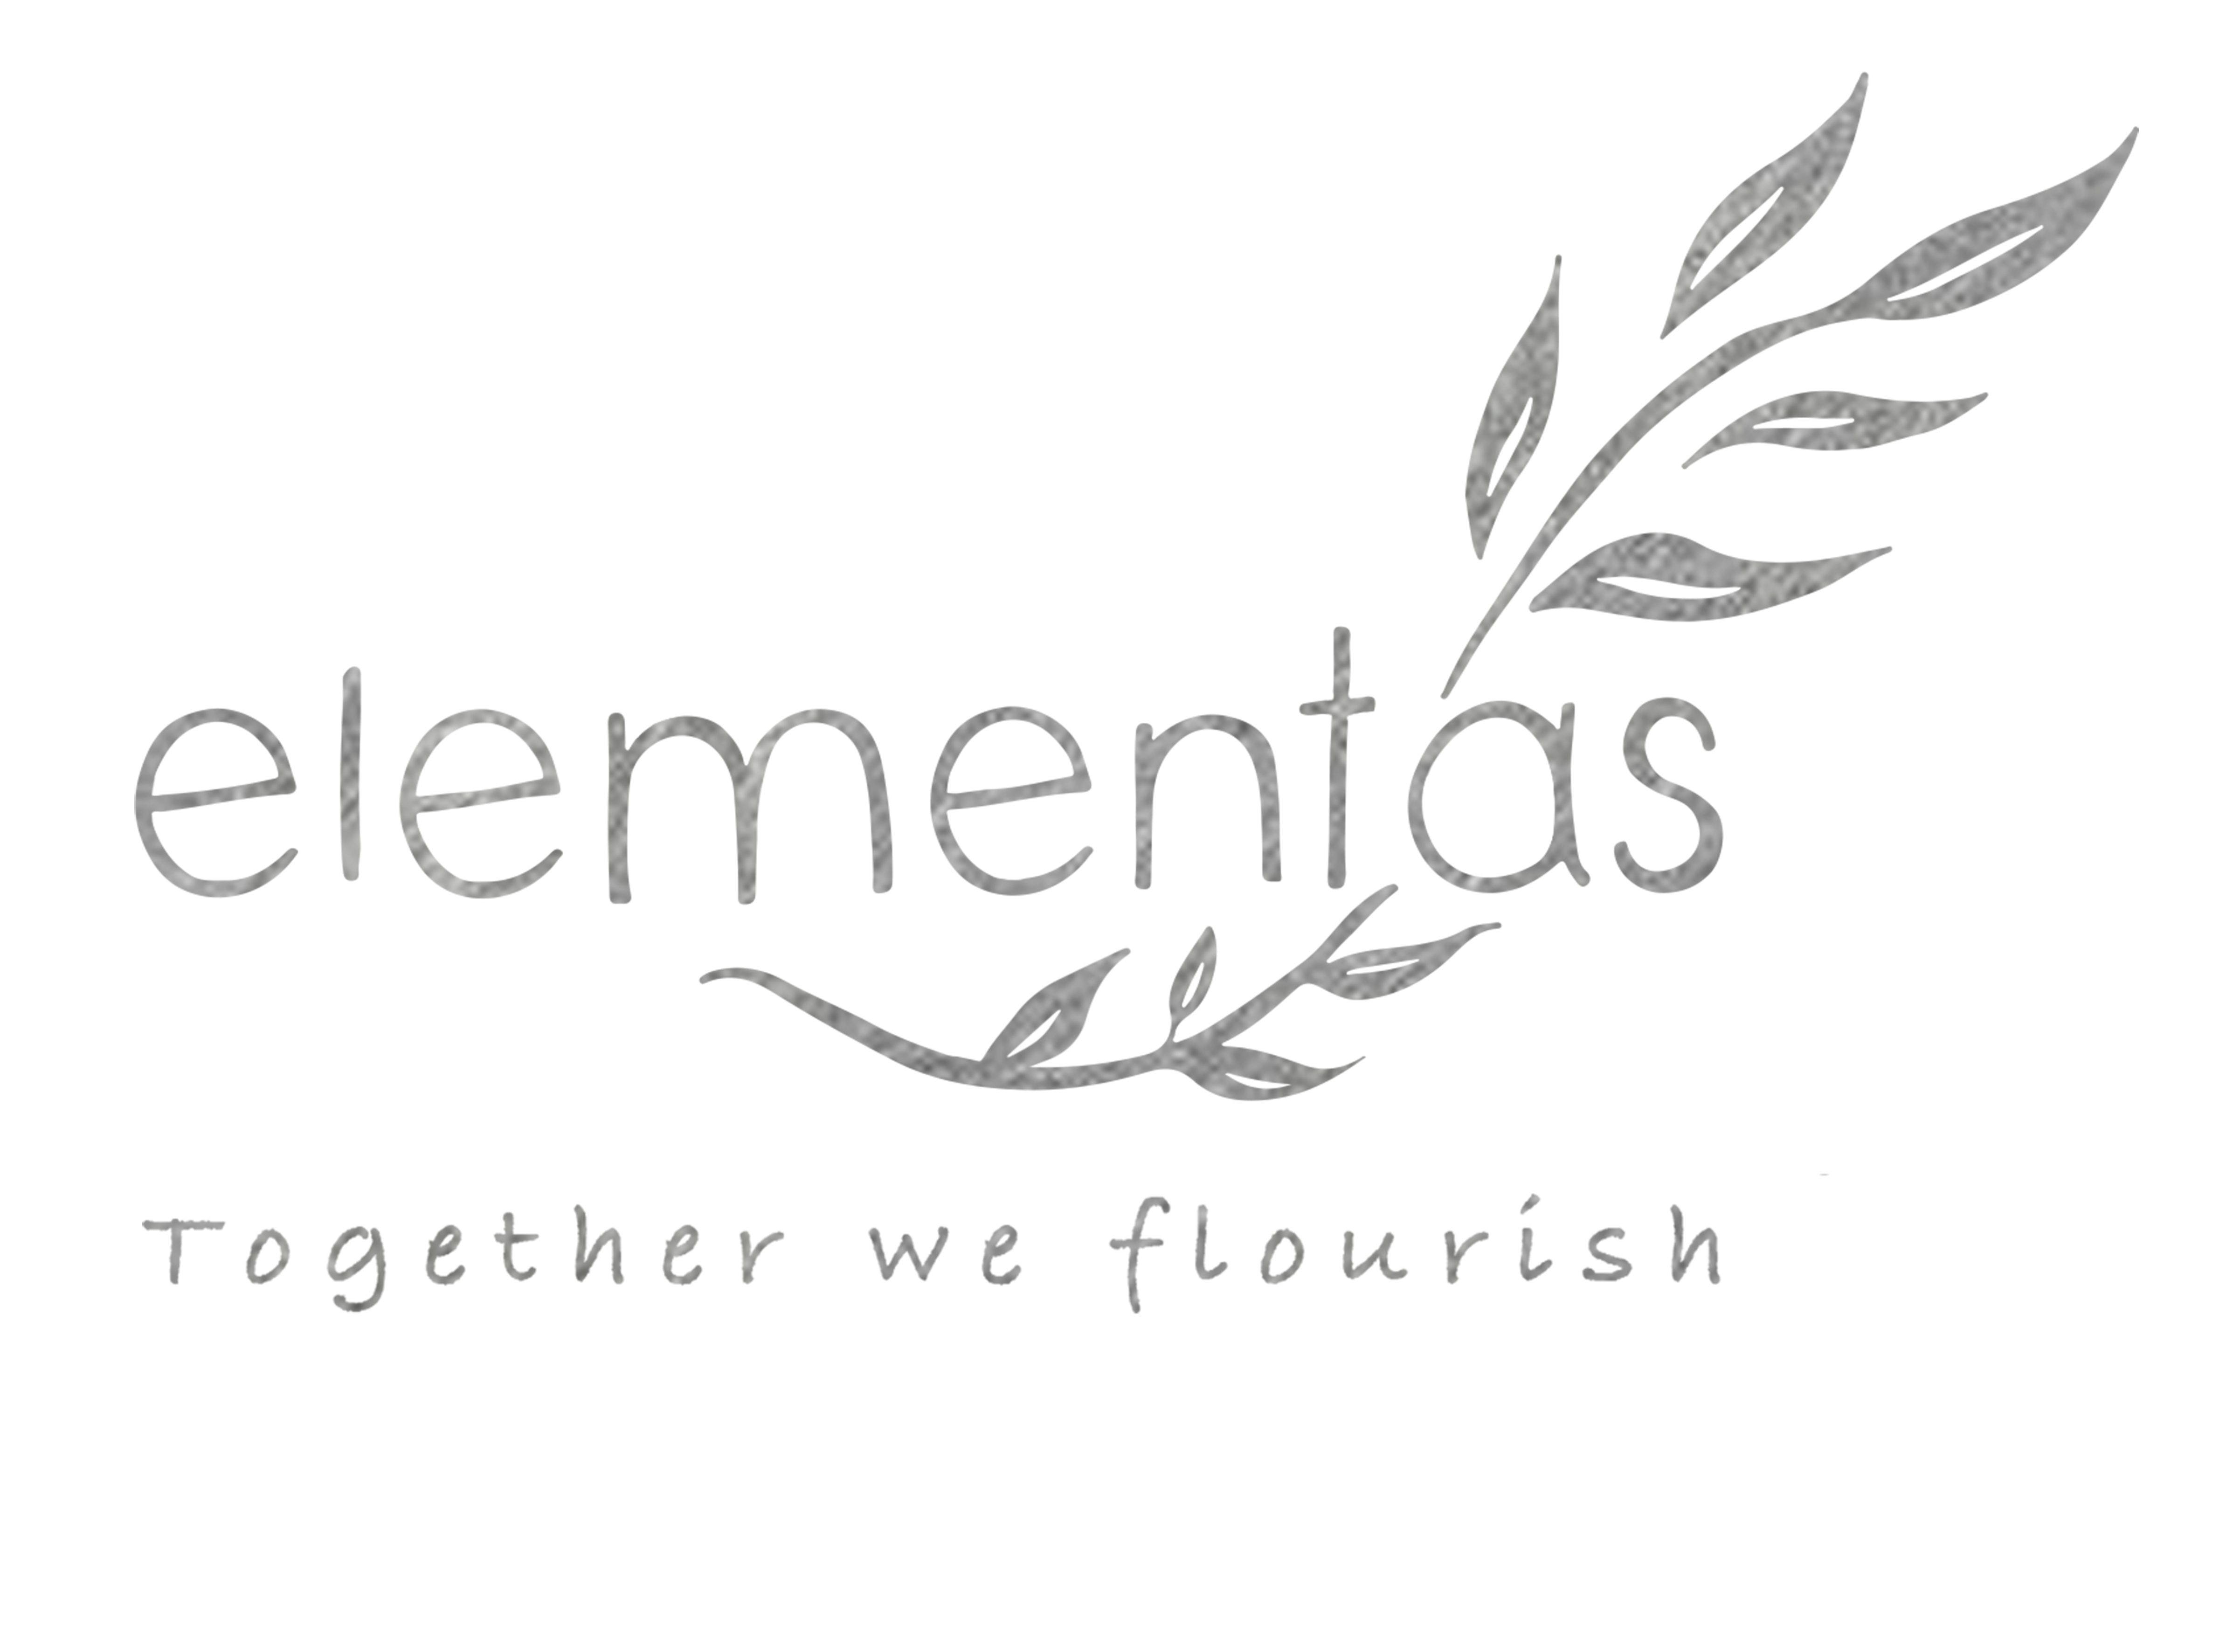 elementas